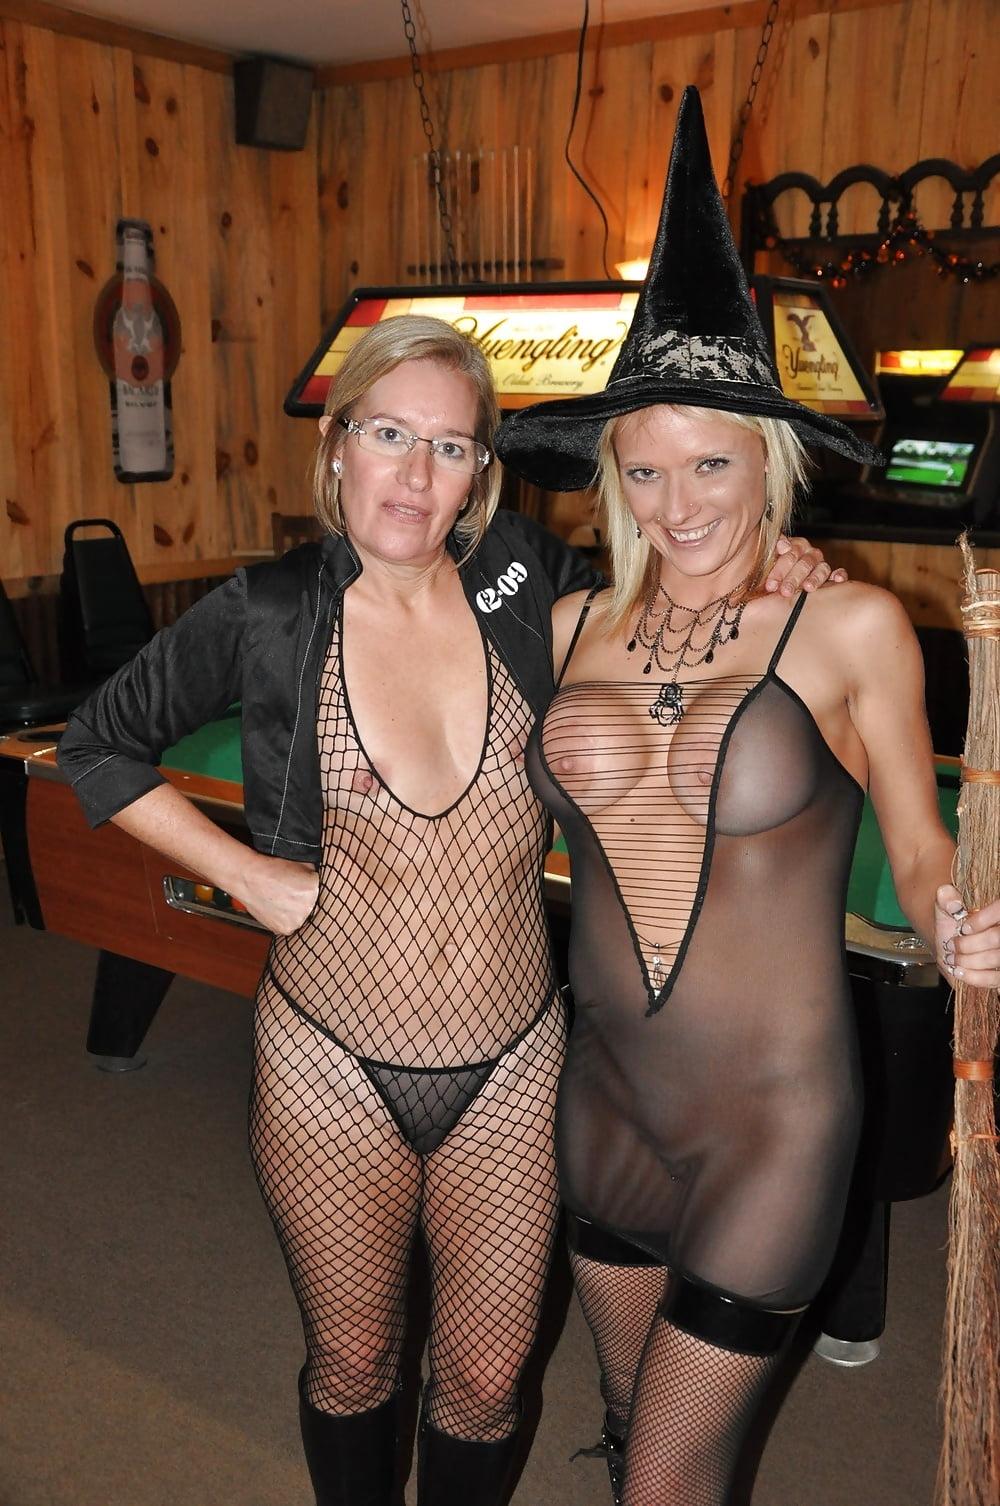 Window voyeur slutty girls fucking in halloween costume nude shower